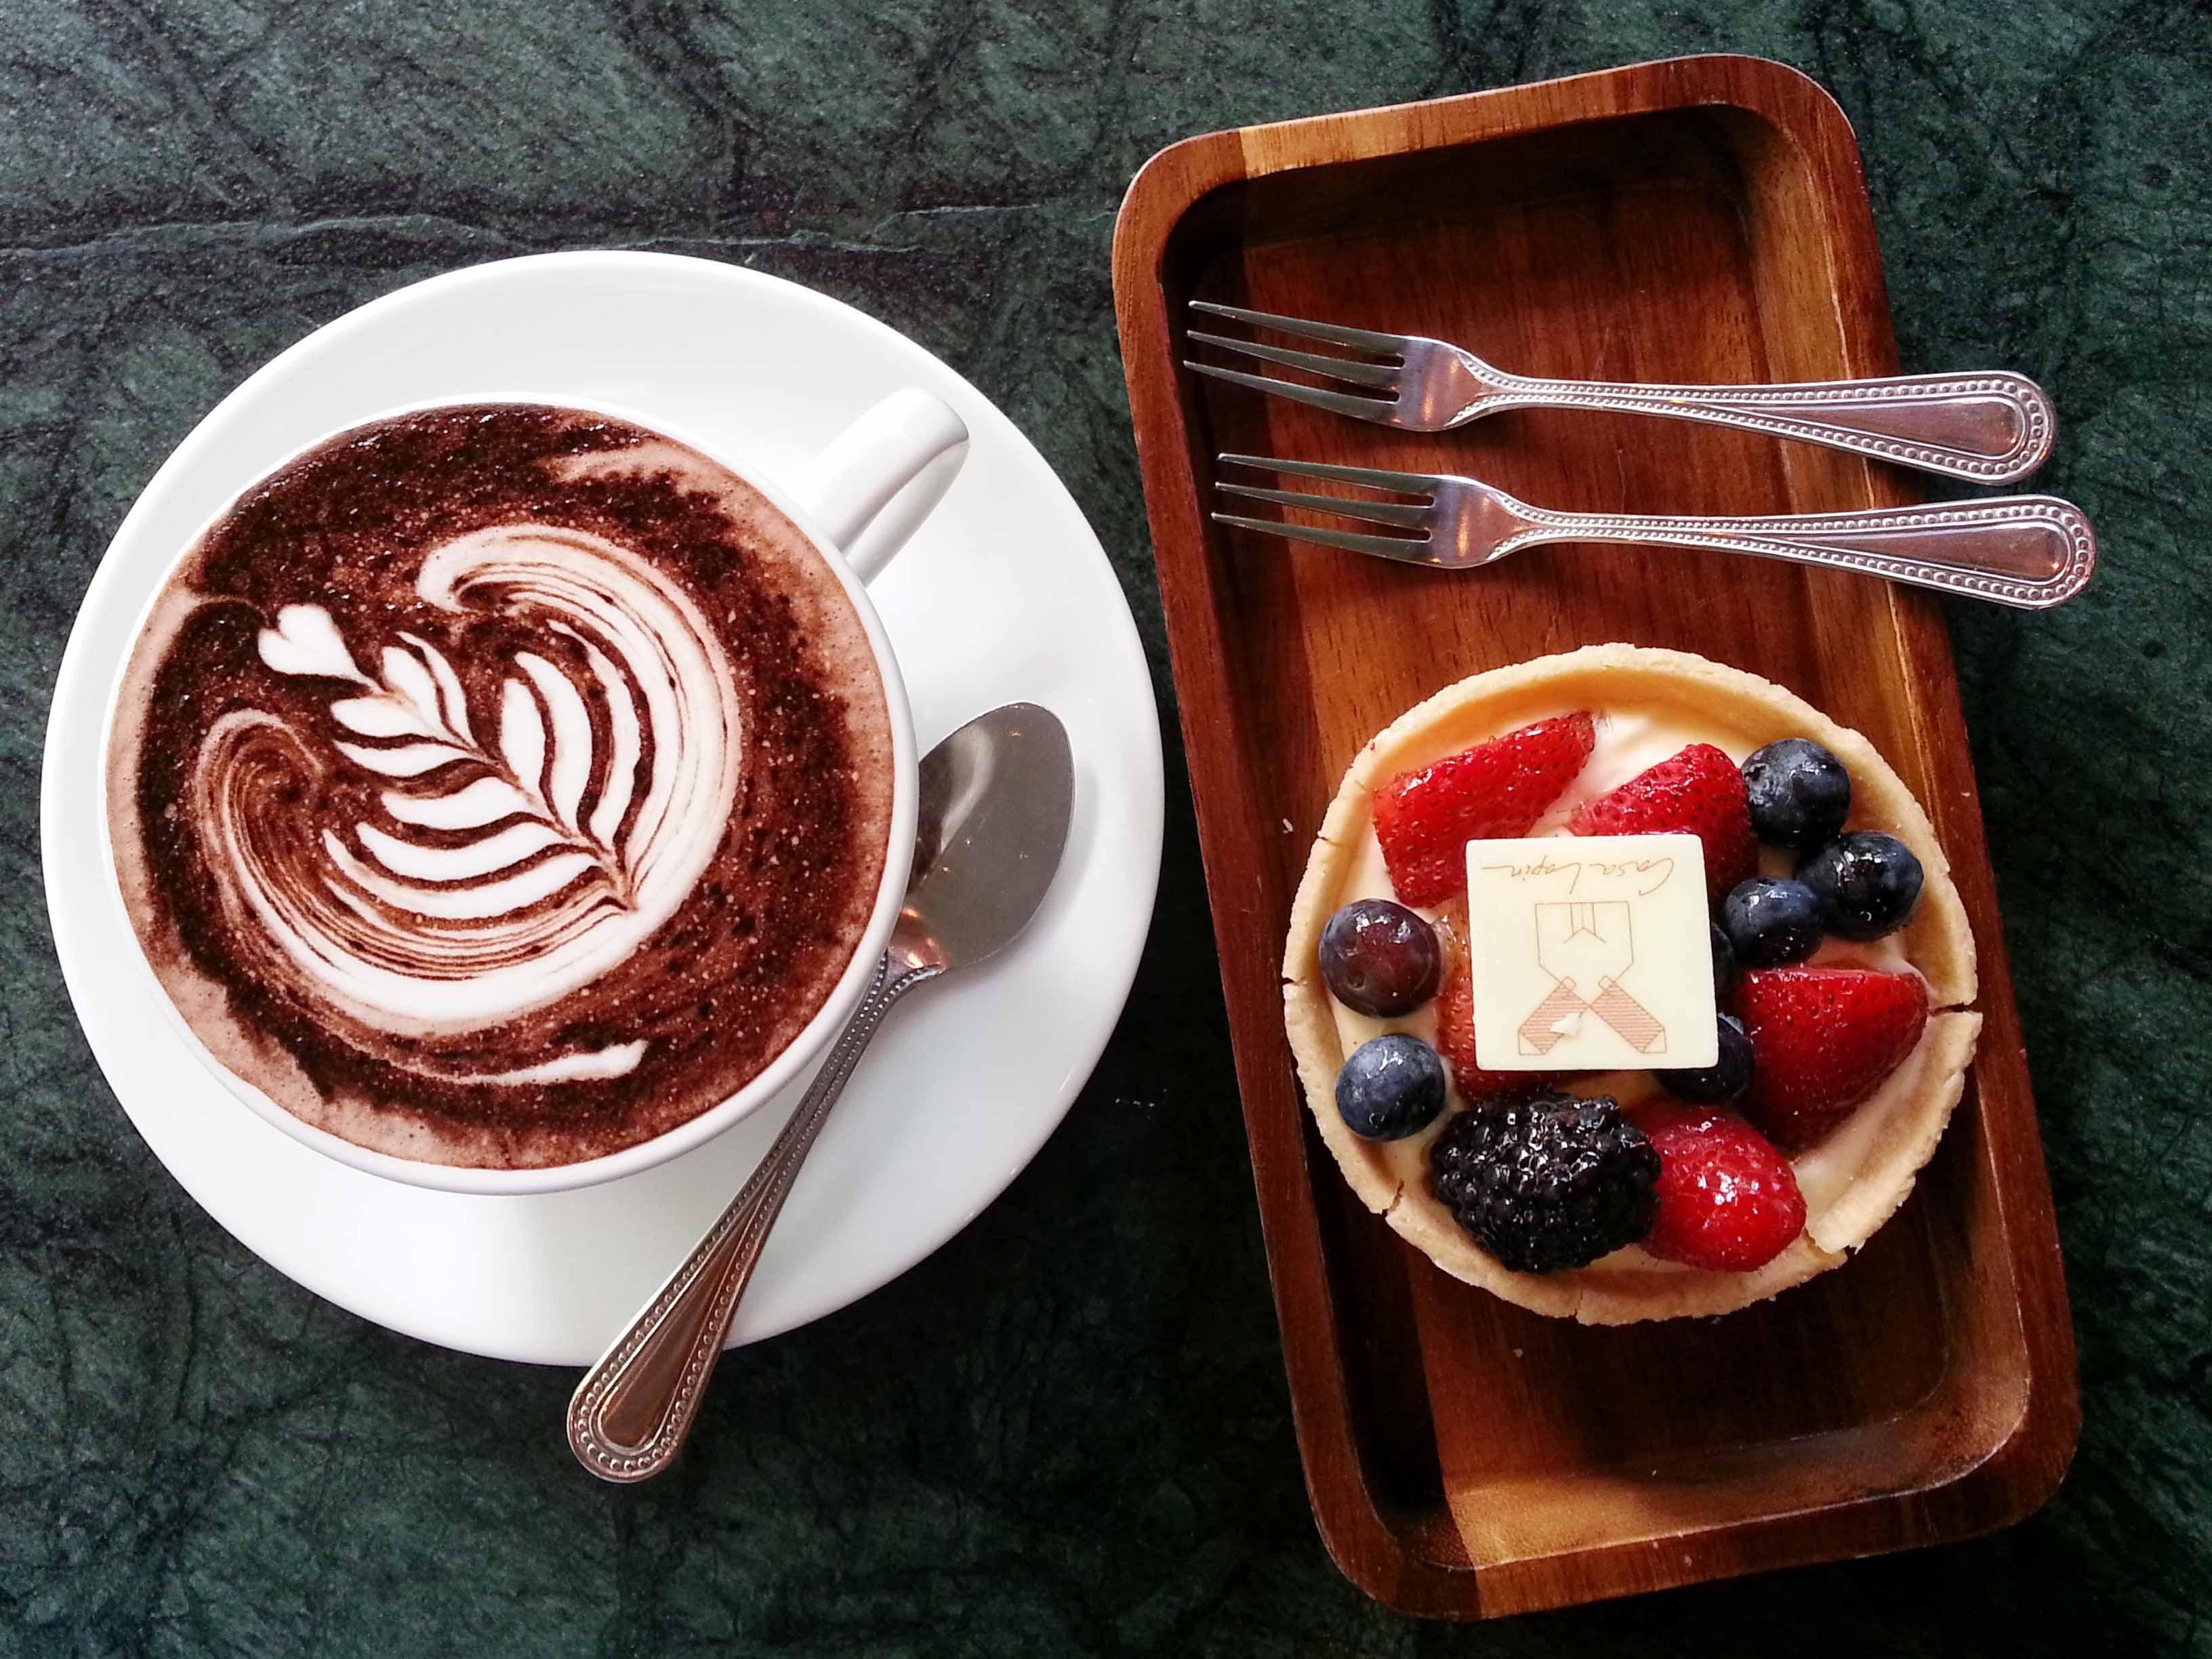 Review cafe เปิดใหม่ย่านอารีย์ Casa Lapin X Ari   Pantip